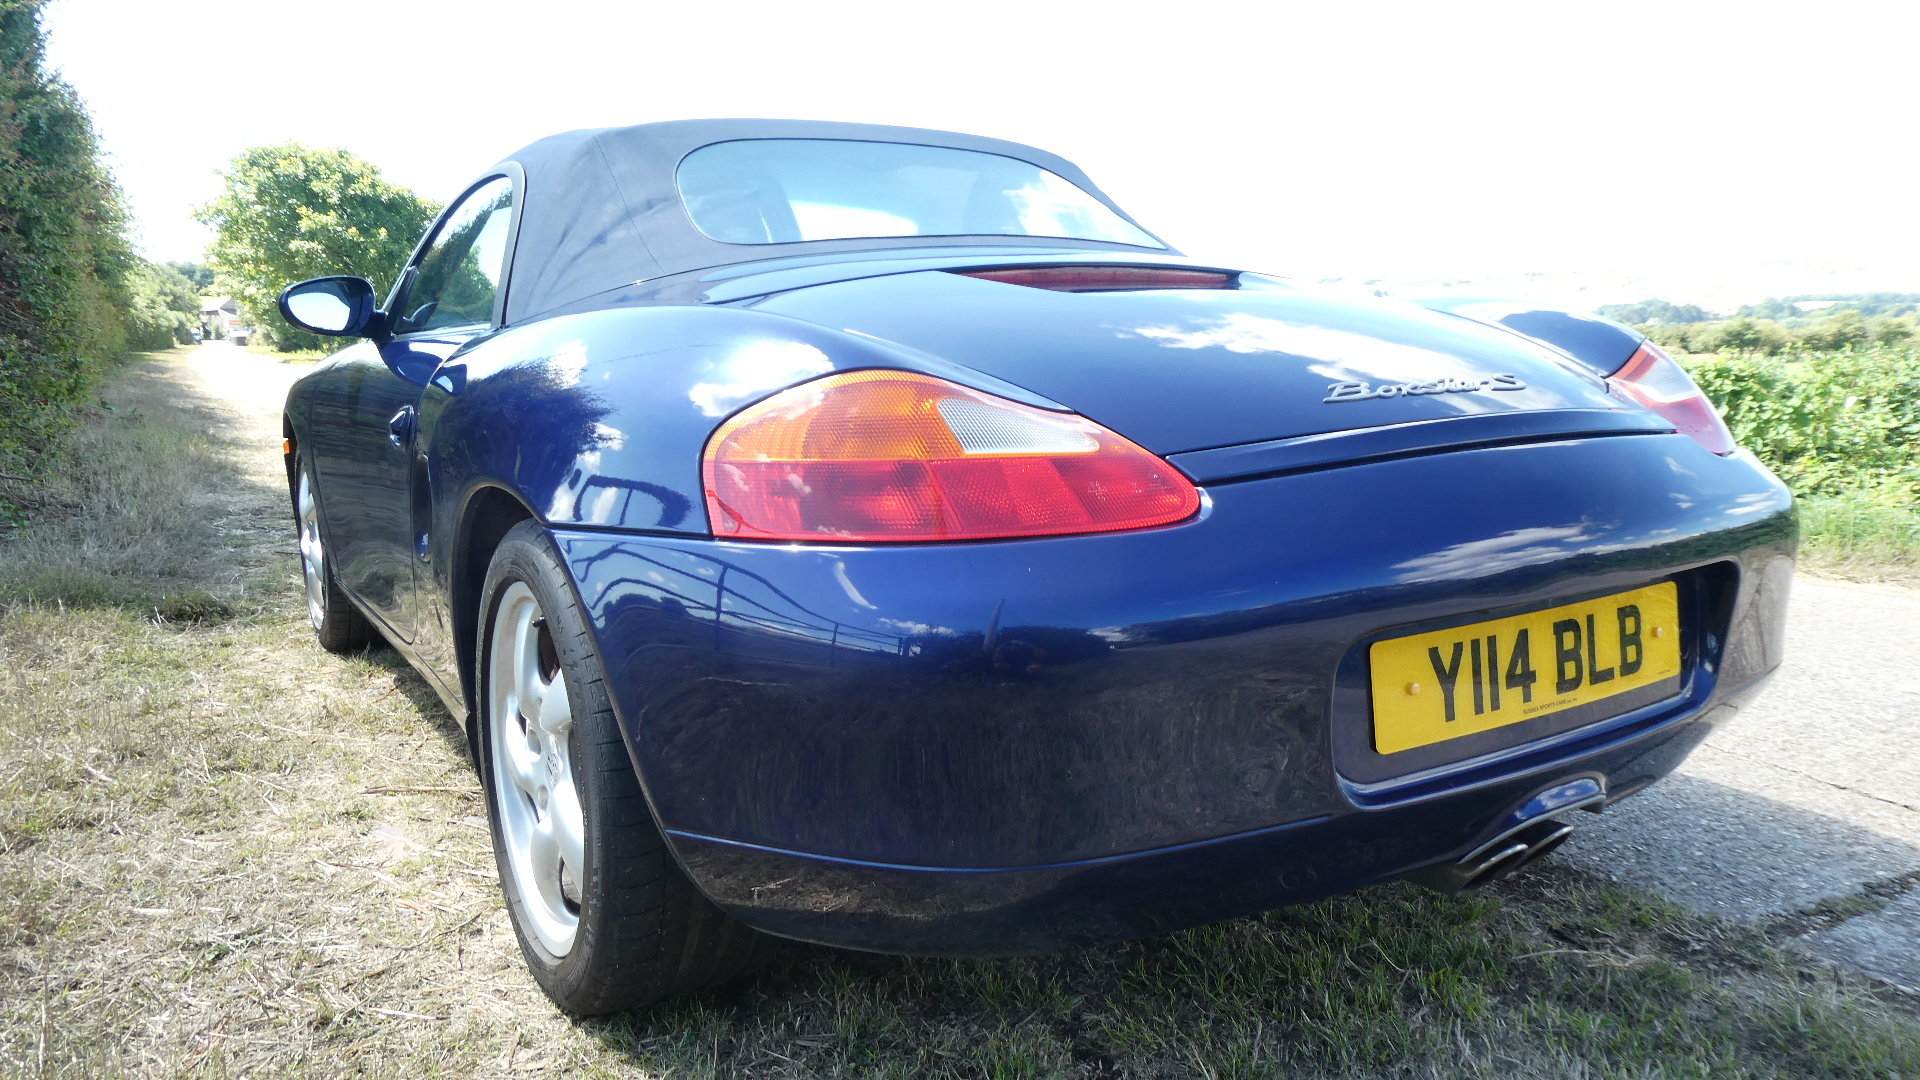 2001 Porsche Boxster S  3.2 litre Convertible  SOLD (picture 4 of 6)